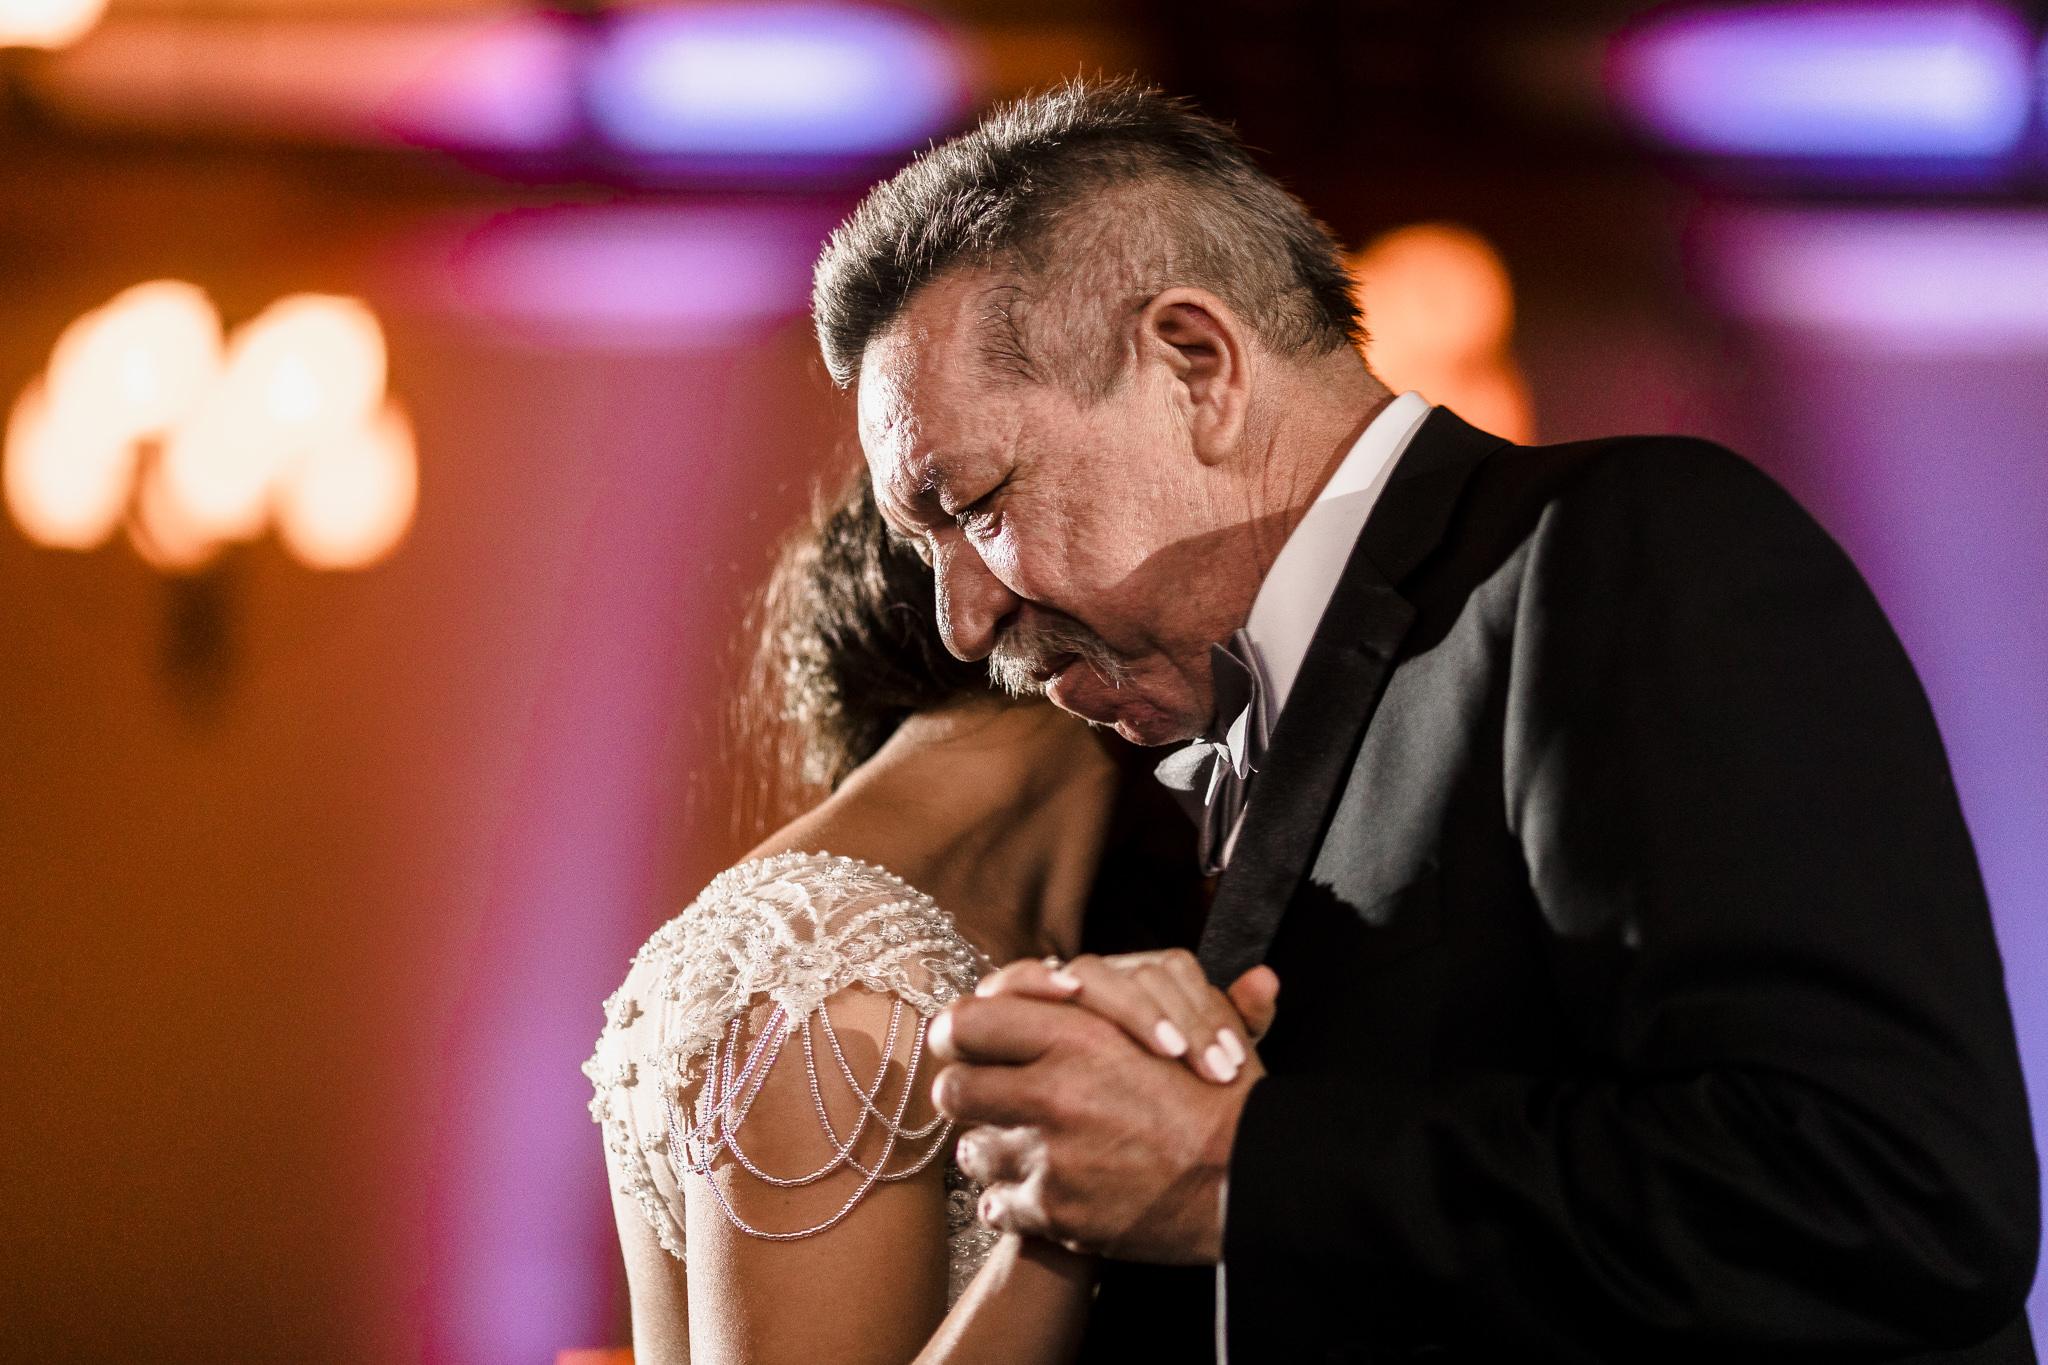 Barbato-Moorestown-Community-House-Wedding-New-Jersey-Photographer-31.JPG